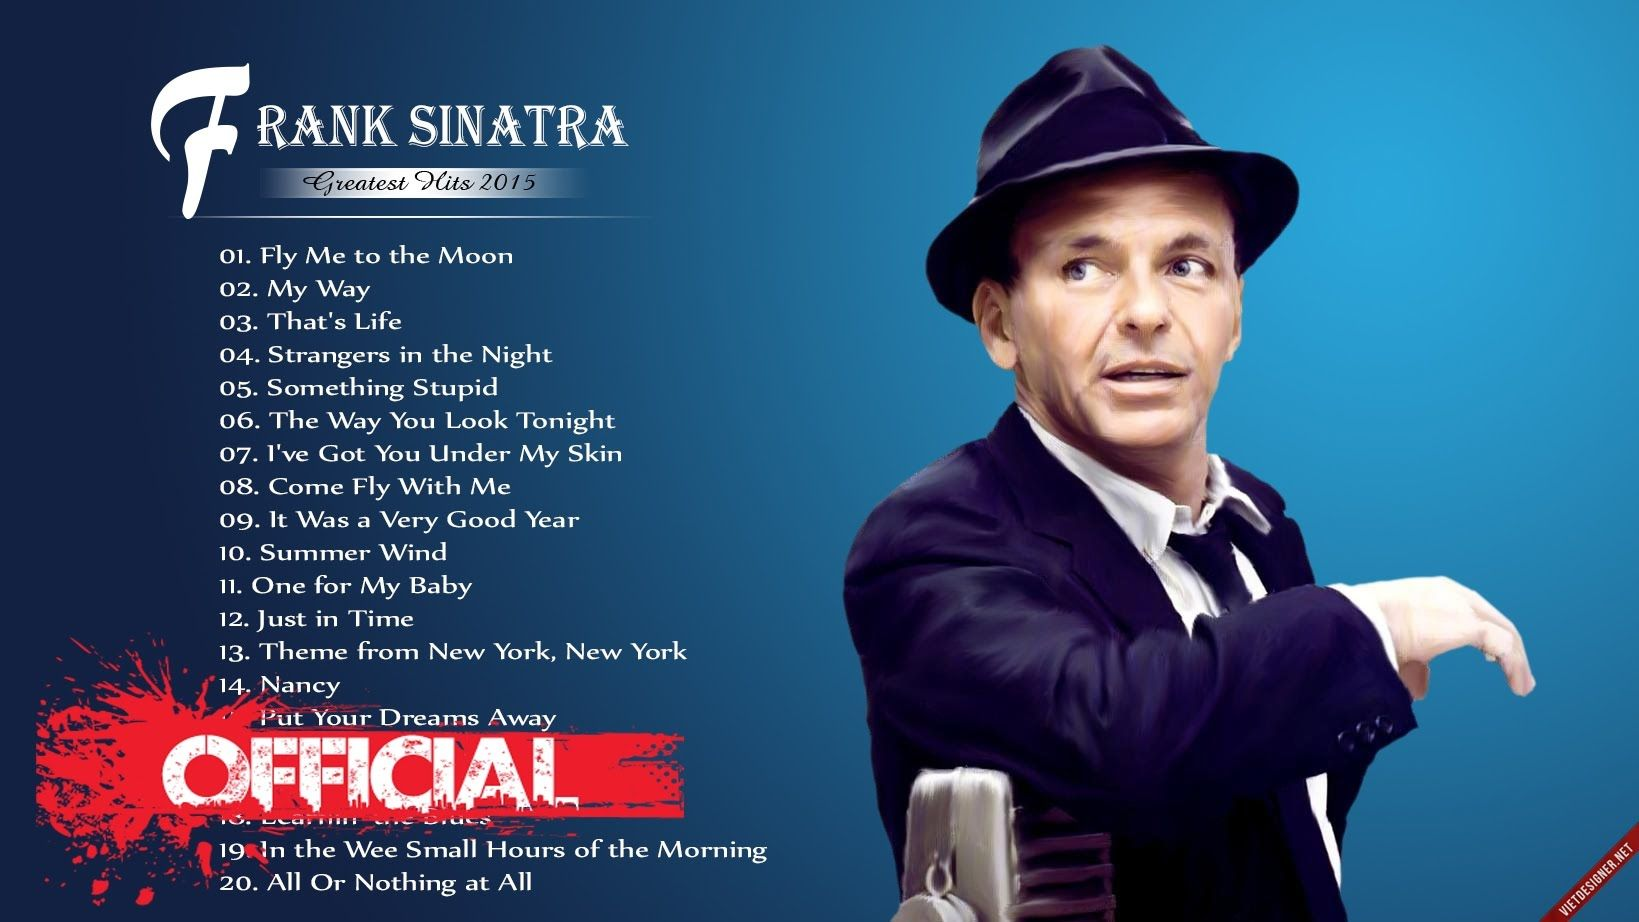 Frank Sinatra Ultimate Sinatra The Centennial